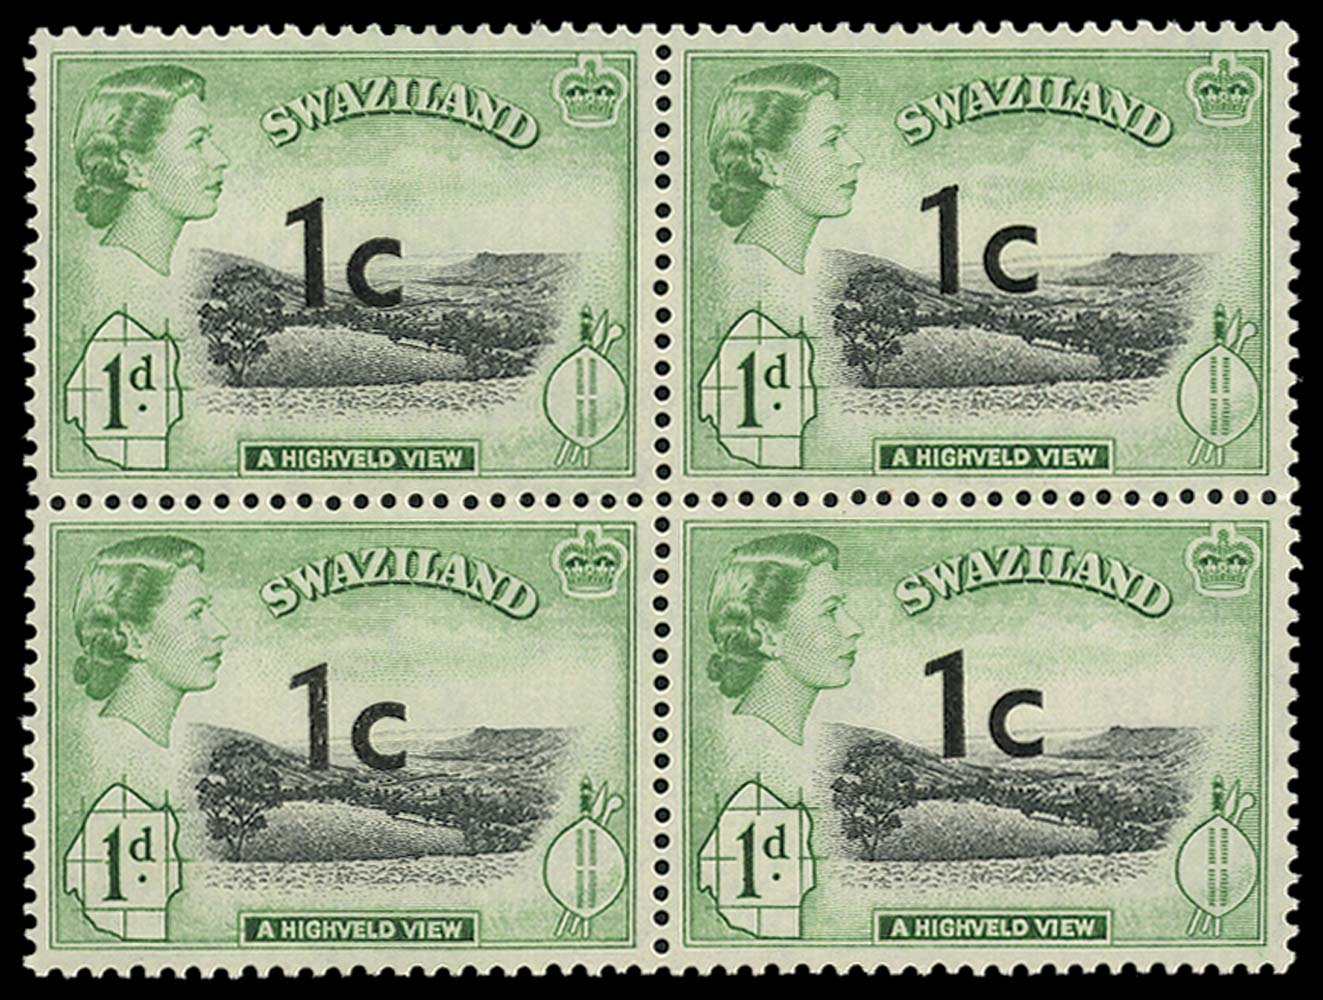 SWAZILAND 1961  SG66 var. Mint